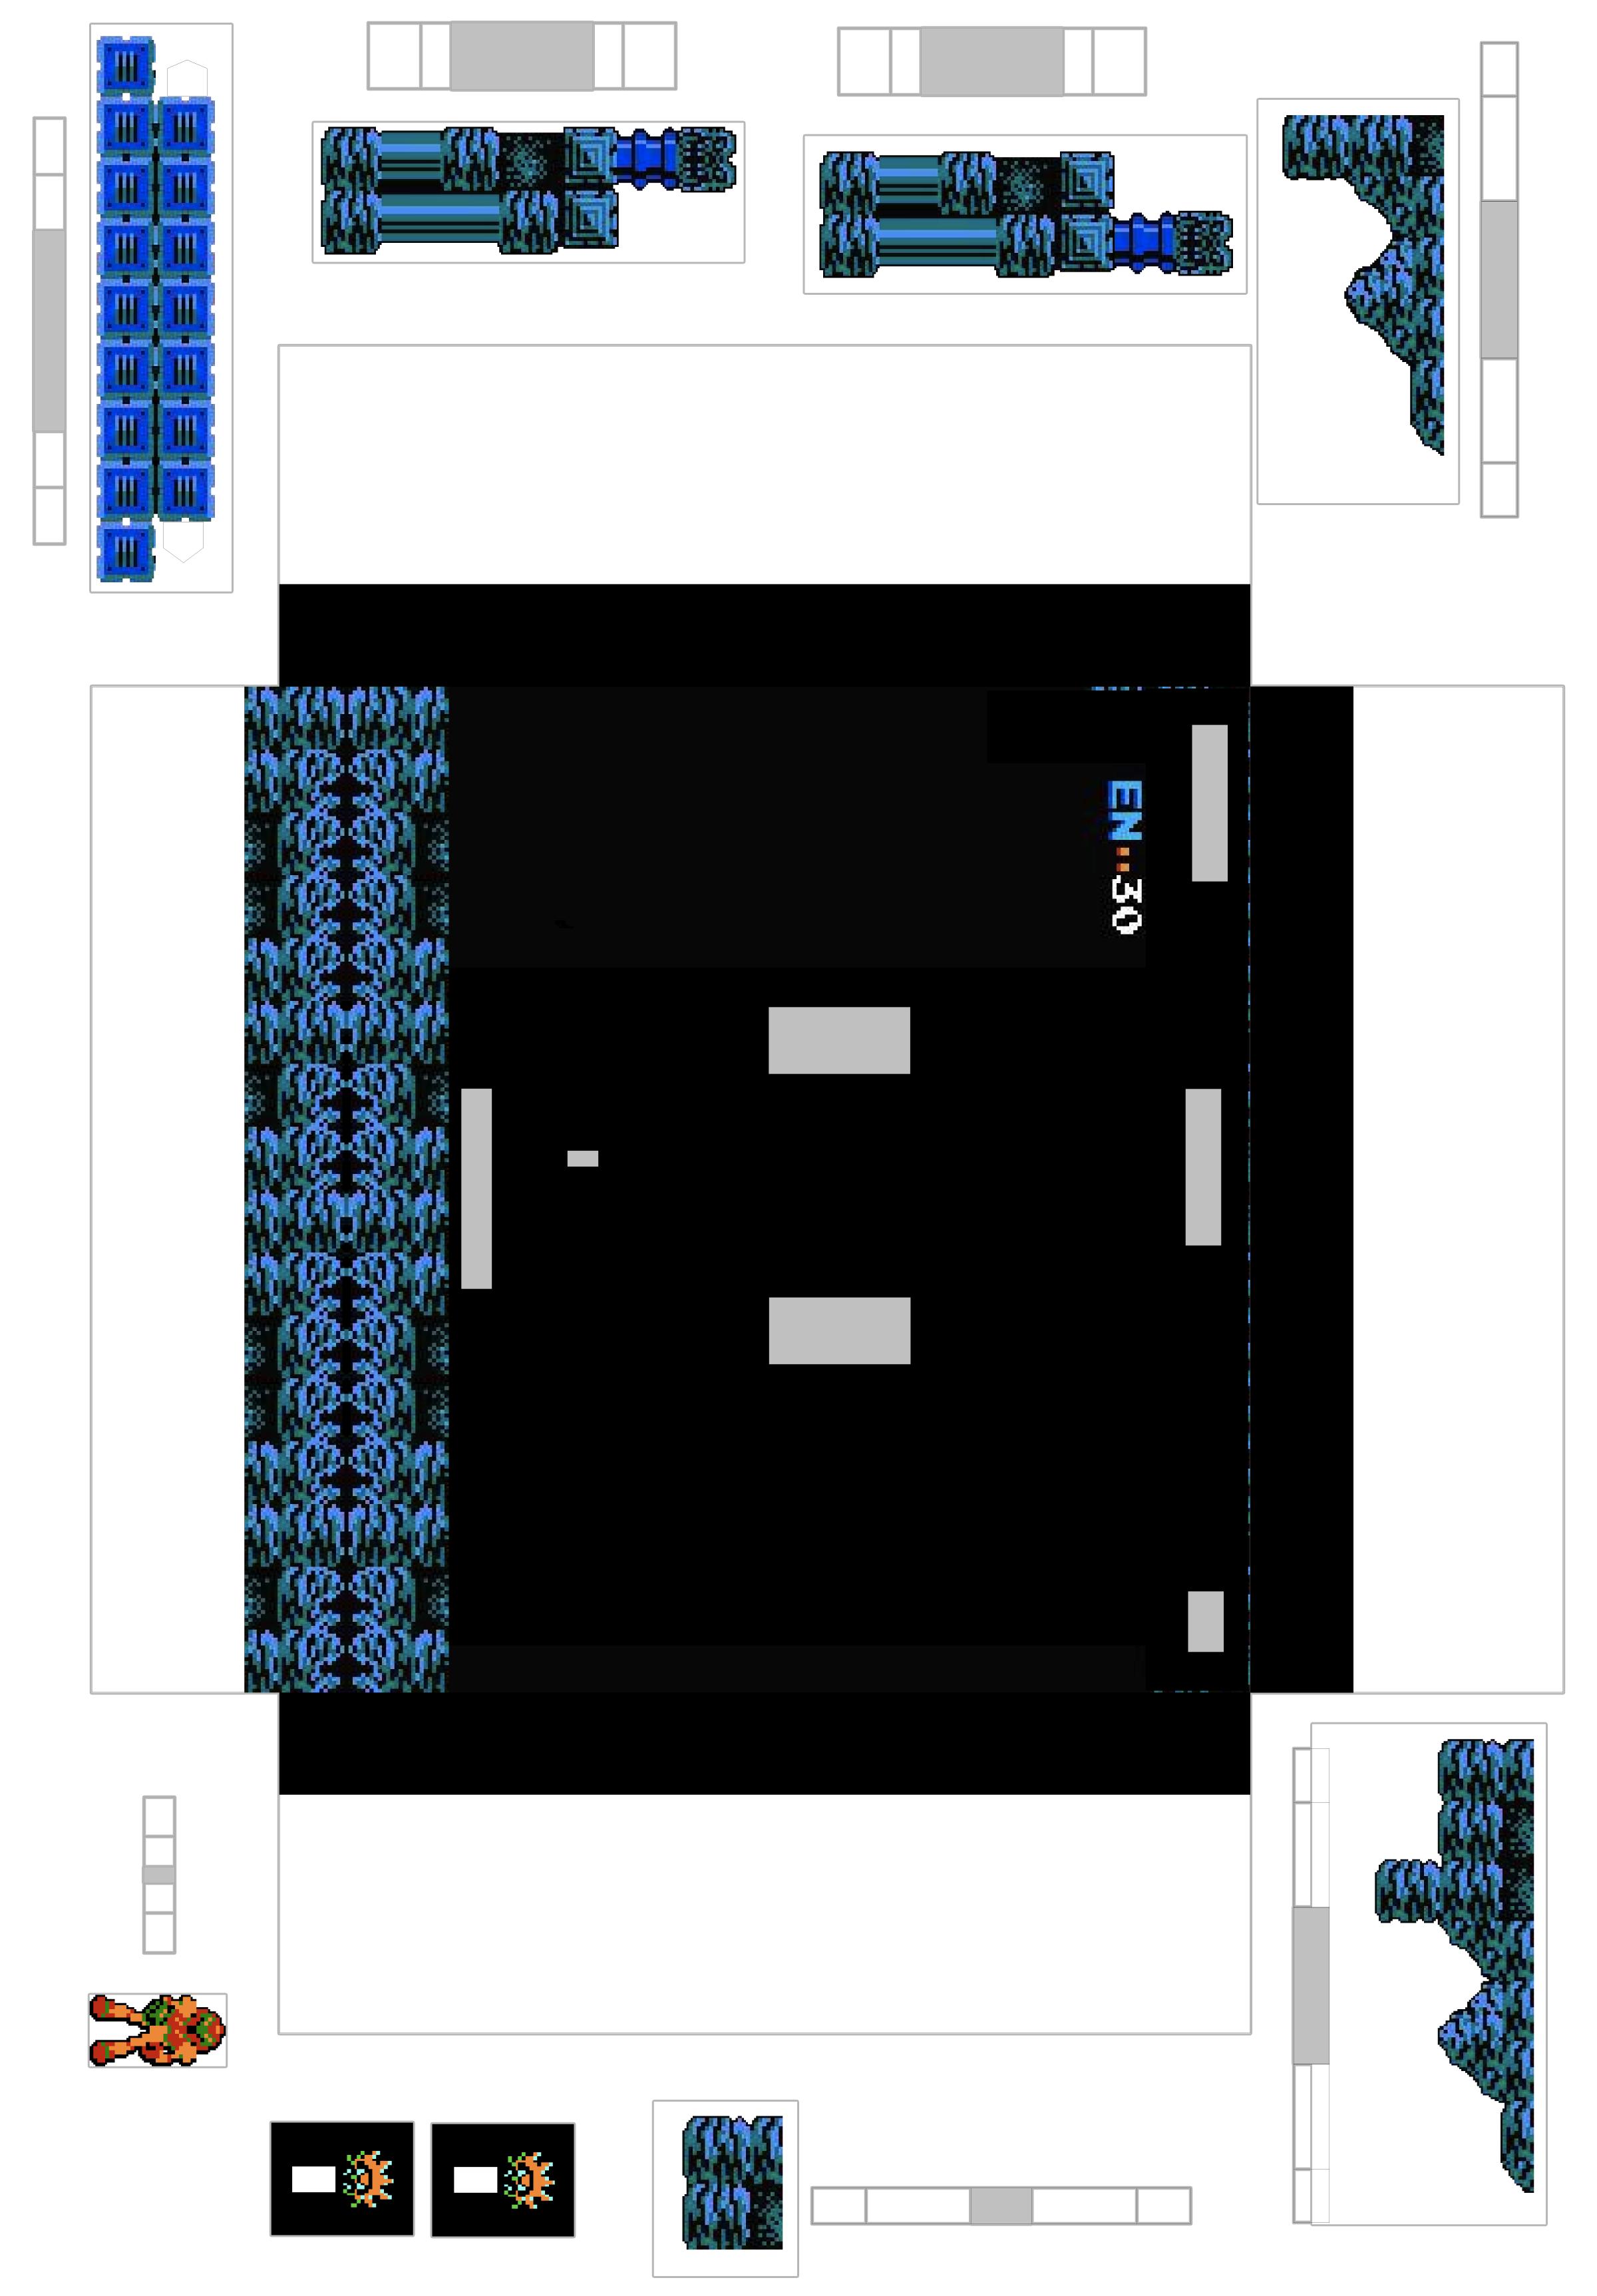 Ikea Ribba Papercraft Part 3 Metroid Dave S Geeky Ideas